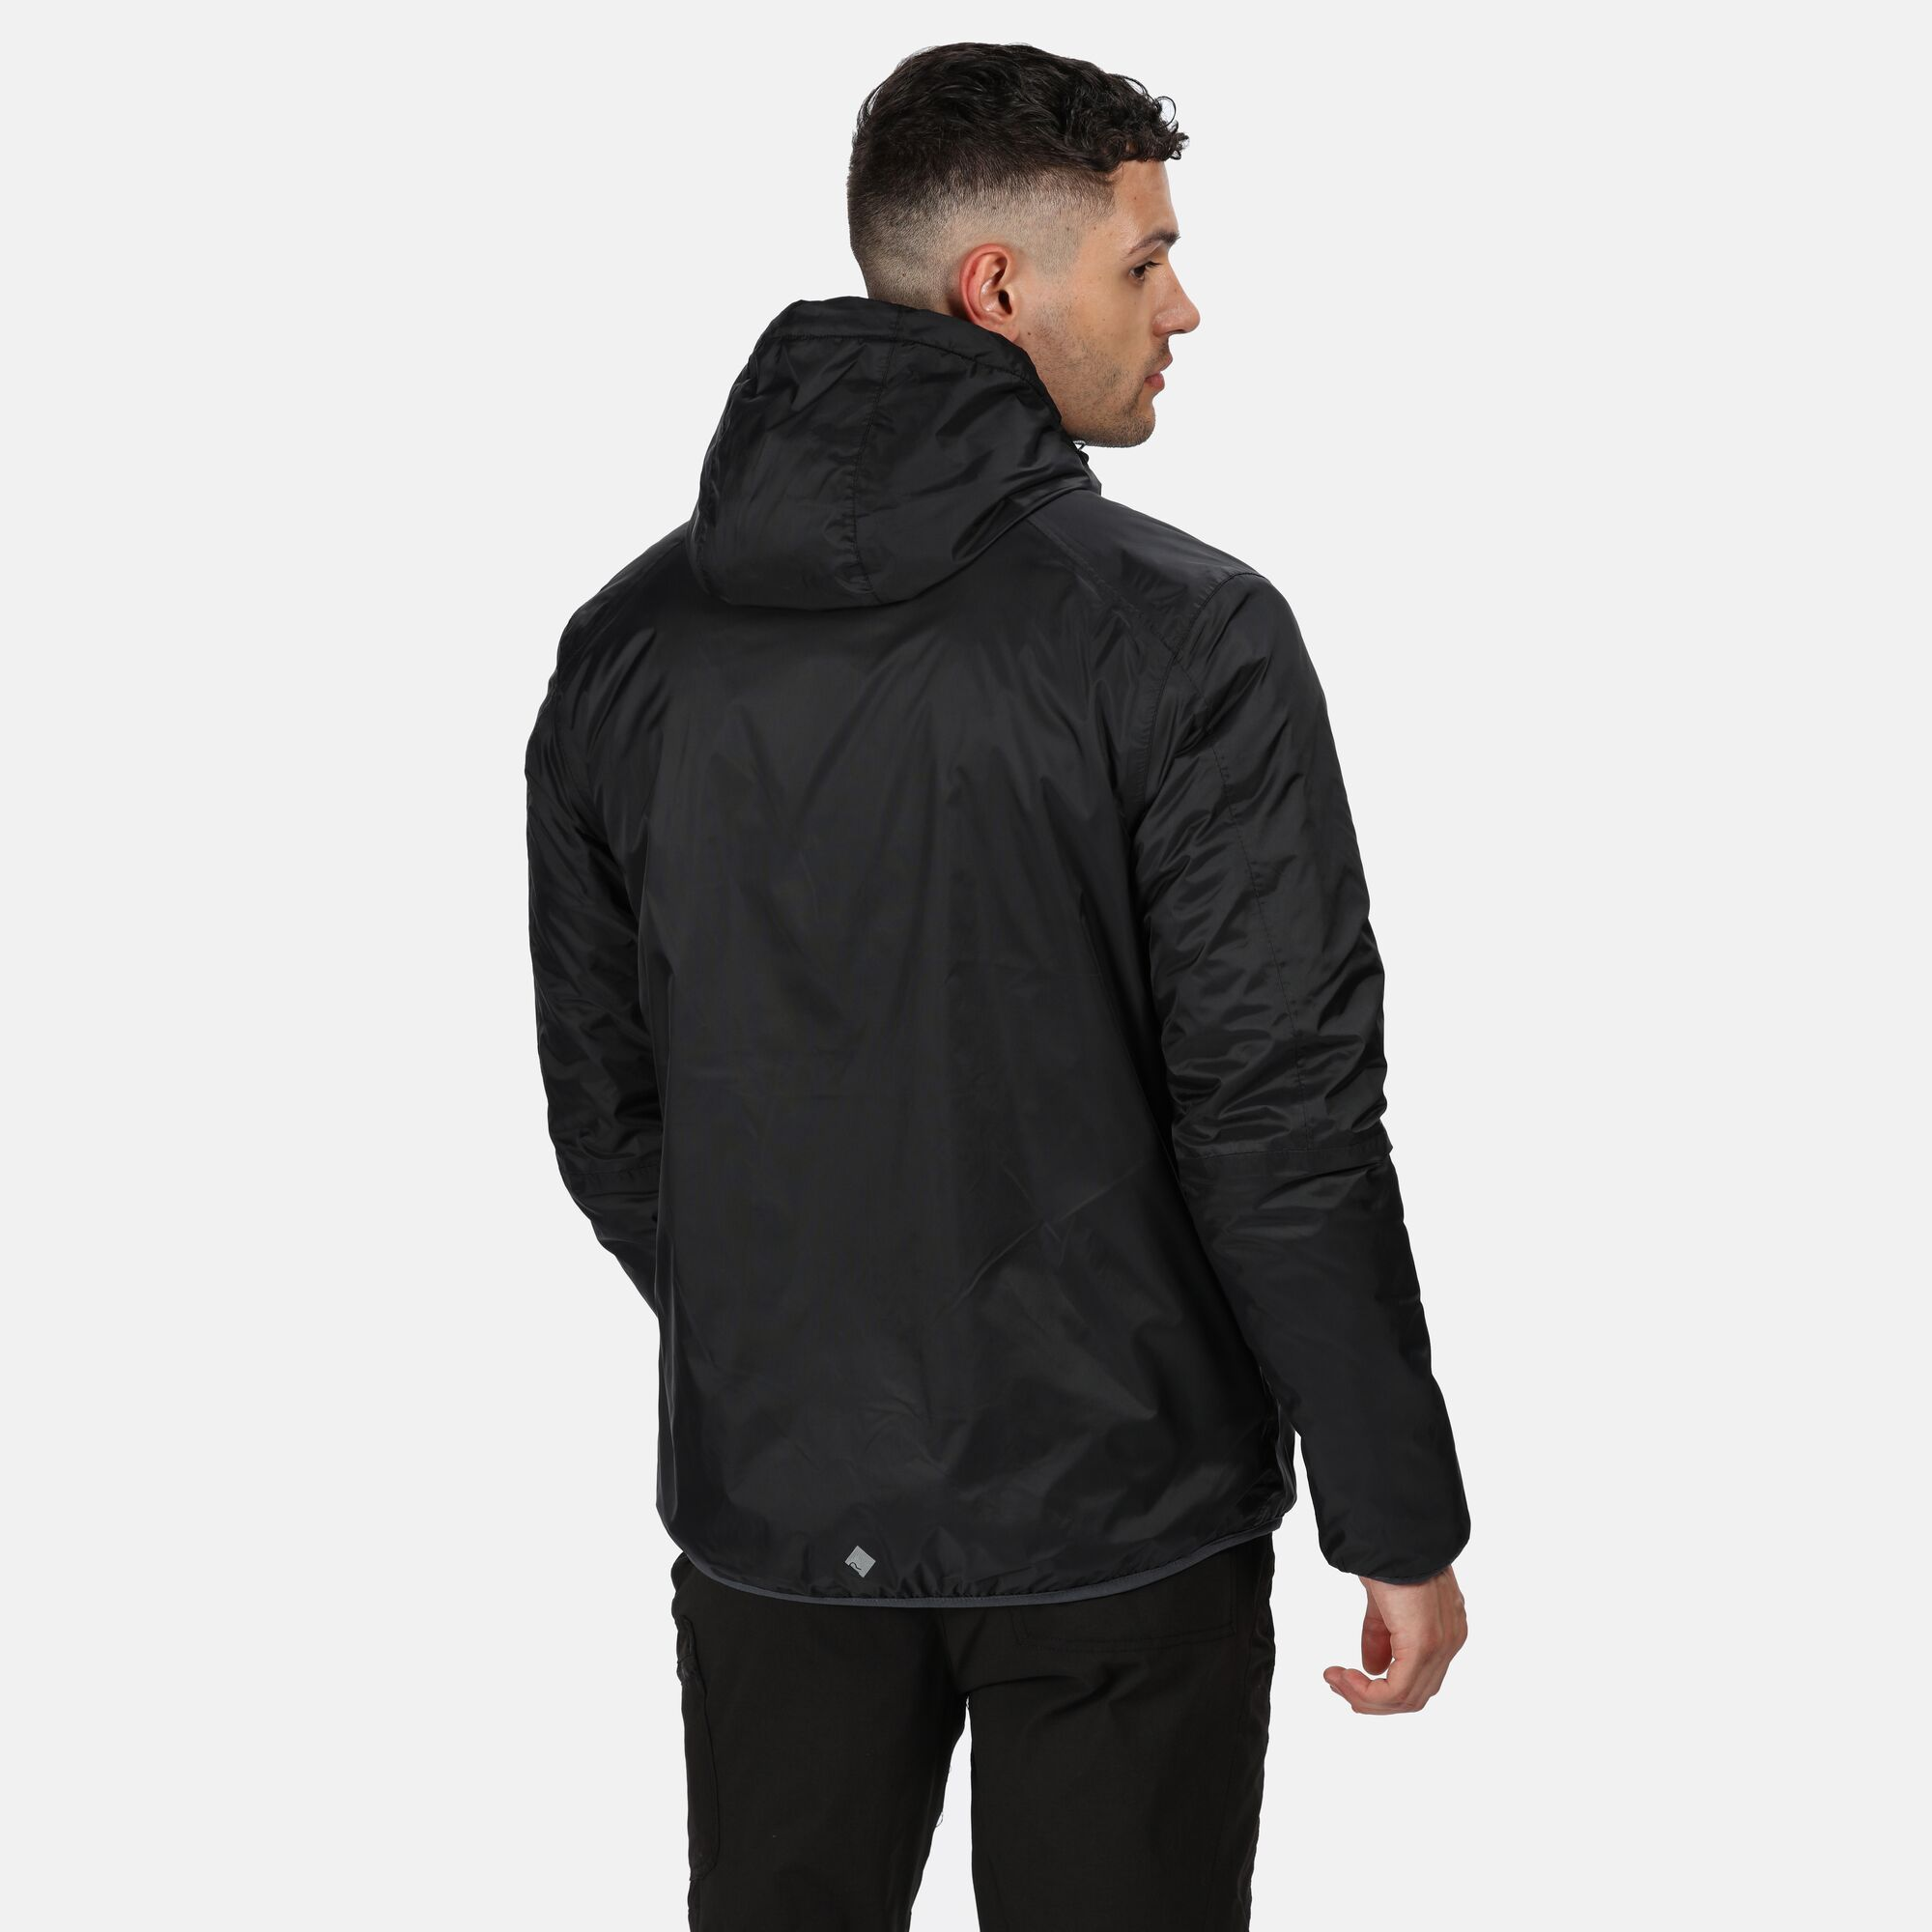 Regatta-Tarren-Mens-Wateproof-Breathable-Fleece-Lined-Jacket-RRP-70 thumbnail 3